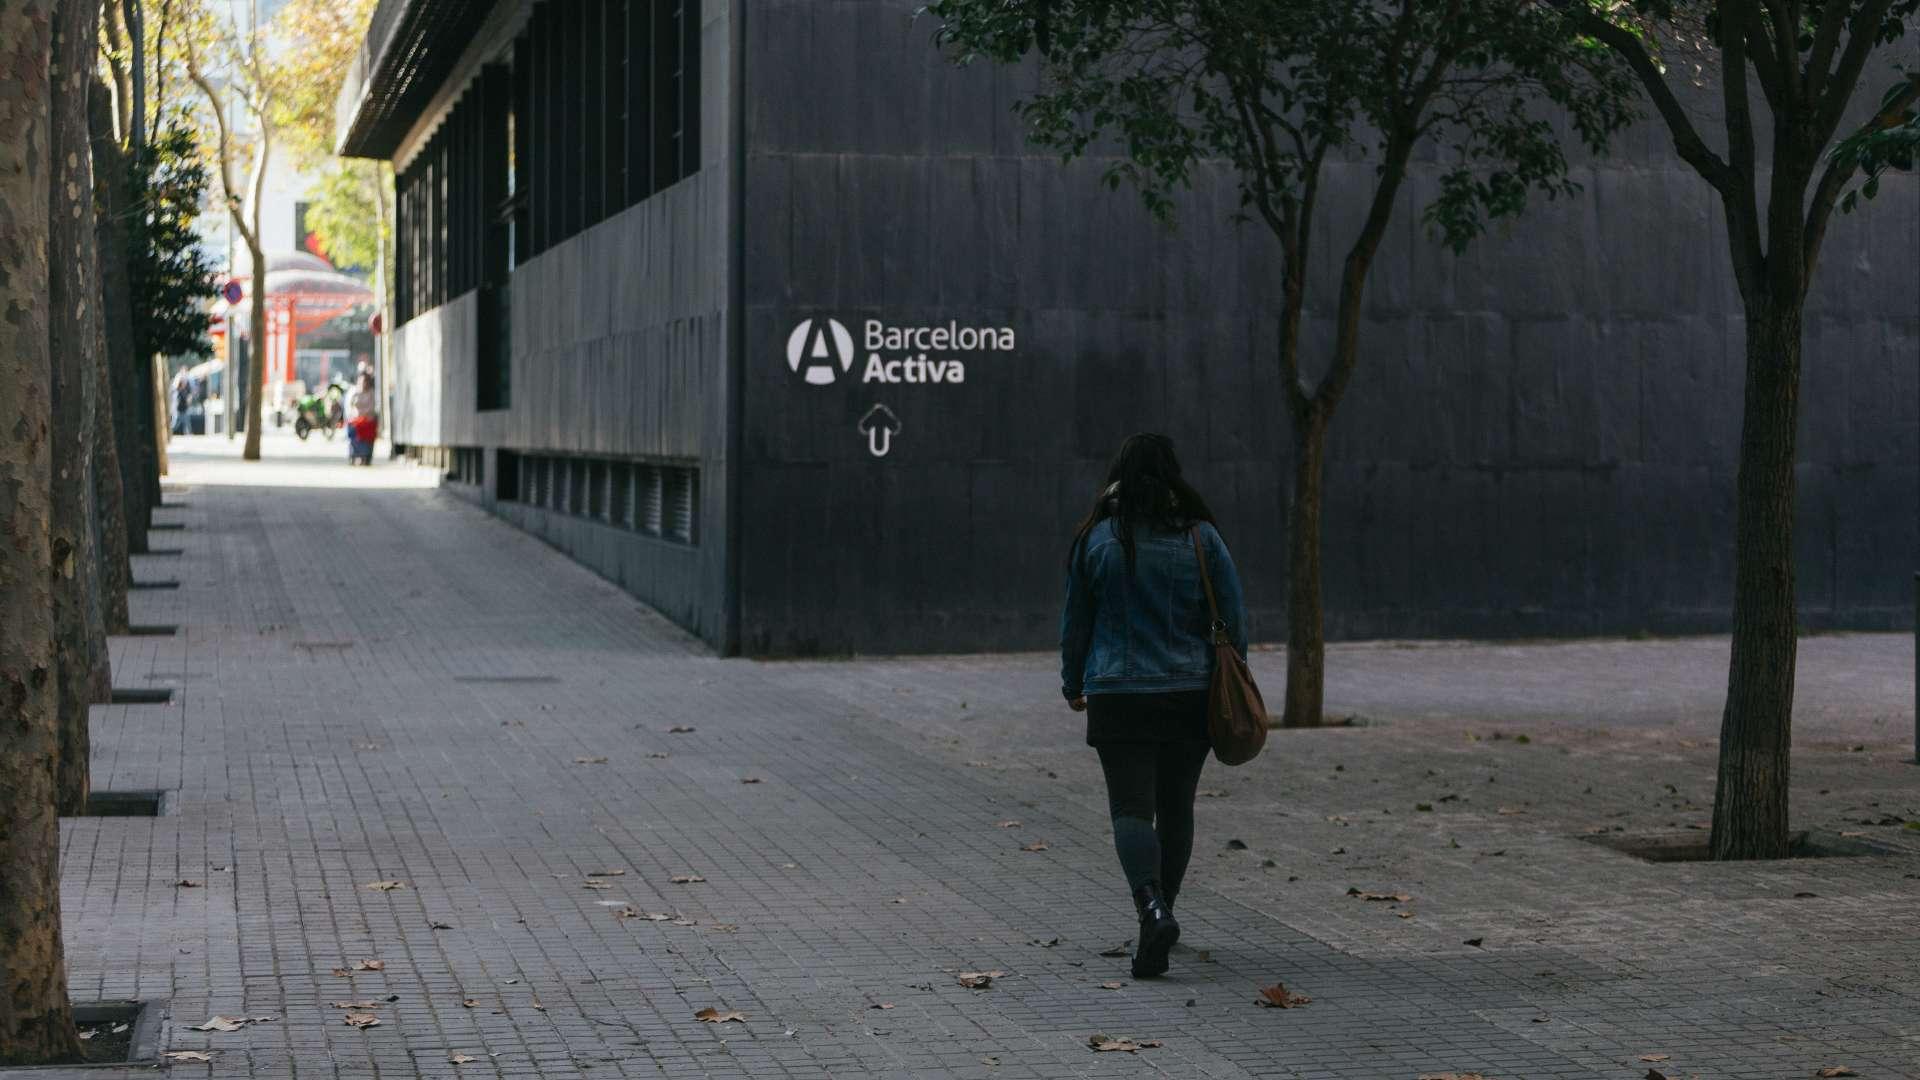 Edifici de Barcelona Activa